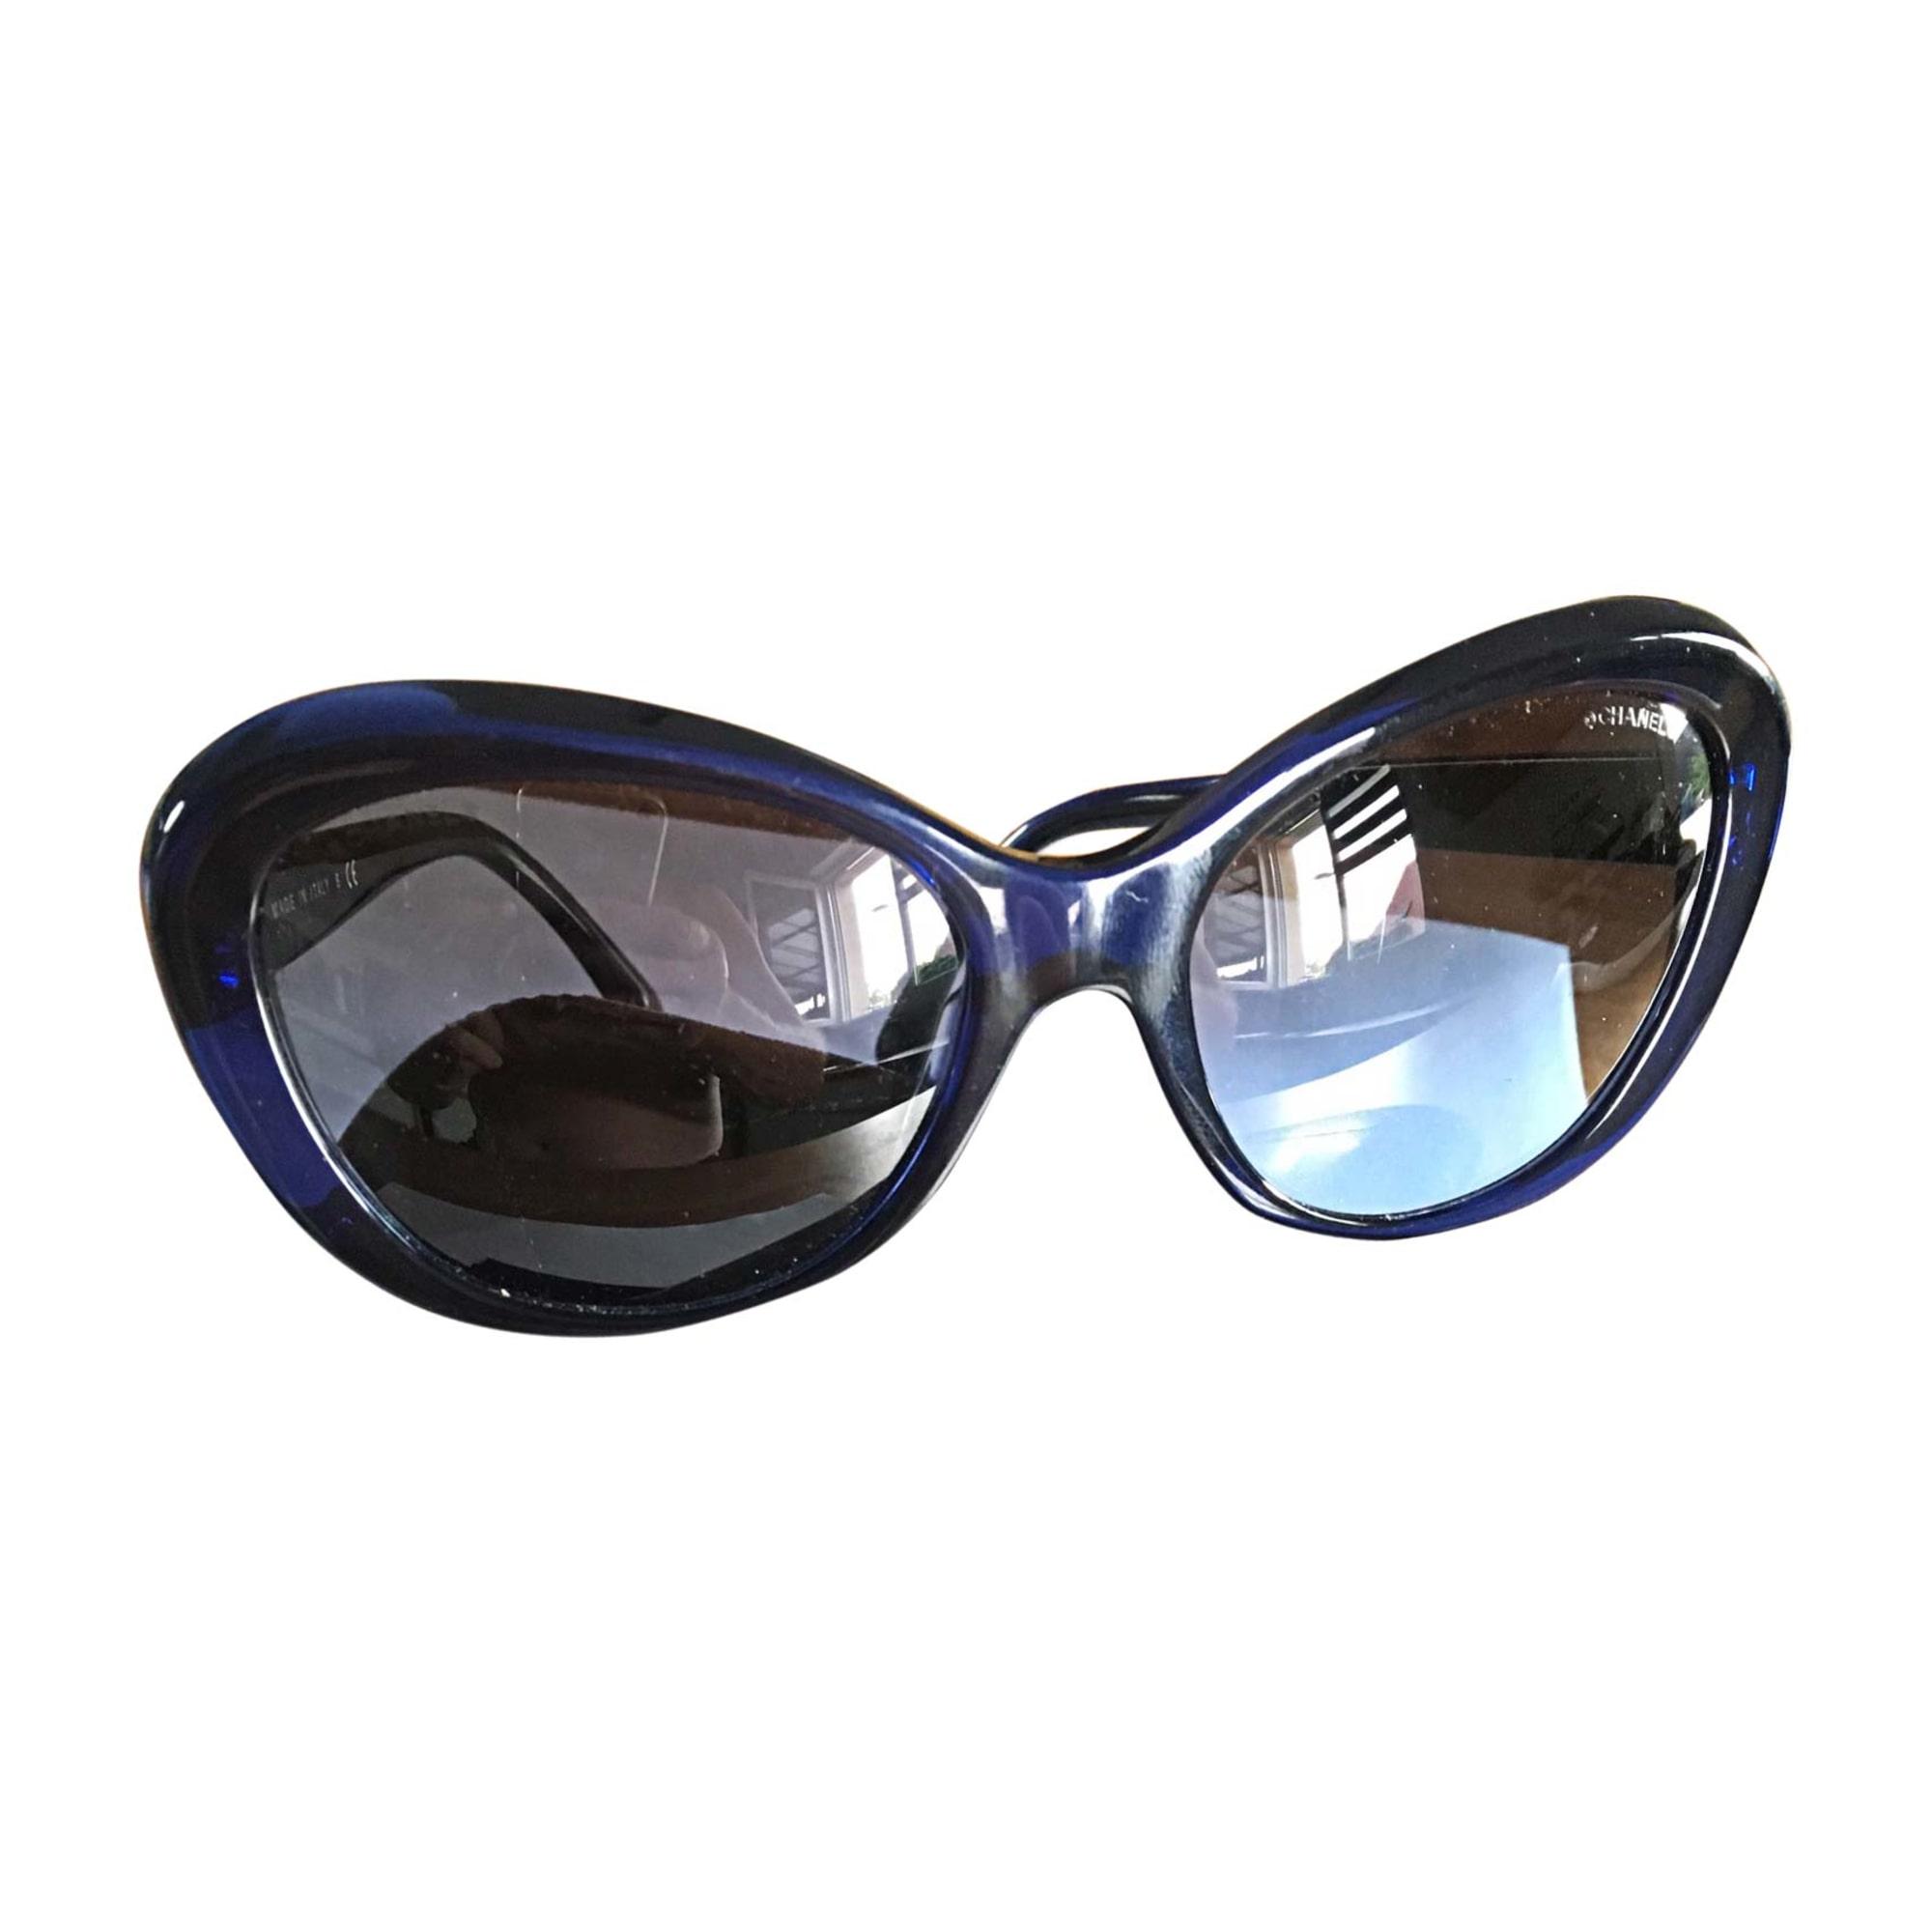 Lunettes de soleil CHANEL Bleu, bleu marine, bleu turquoise 9e17d45d5a0b